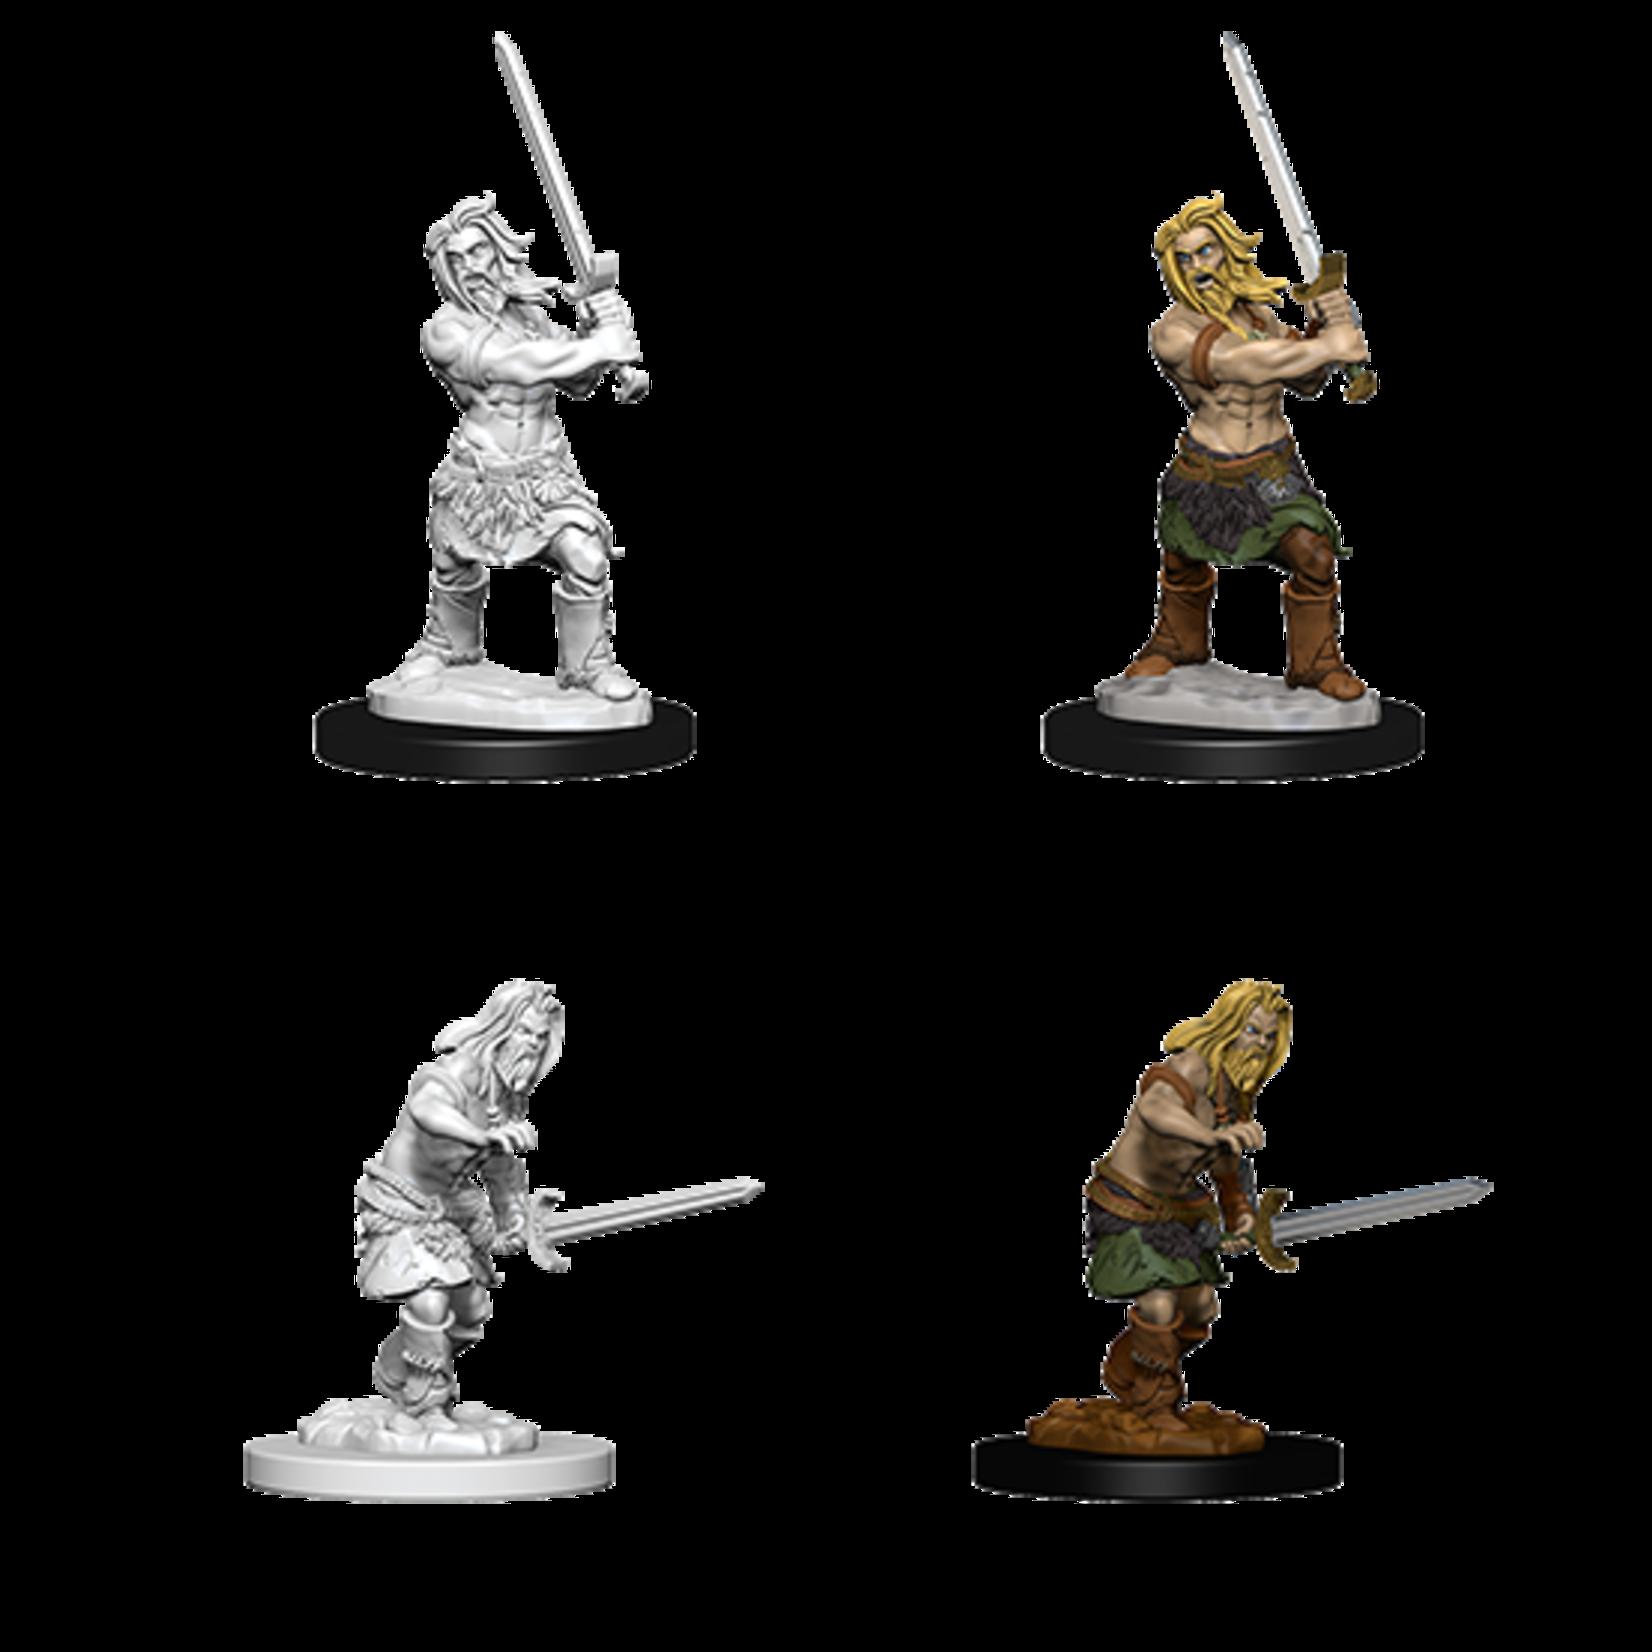 WizKids Pathfinder Battles Deep Cuts Unpainted Miniatures: Human Male Barbarian (W6)